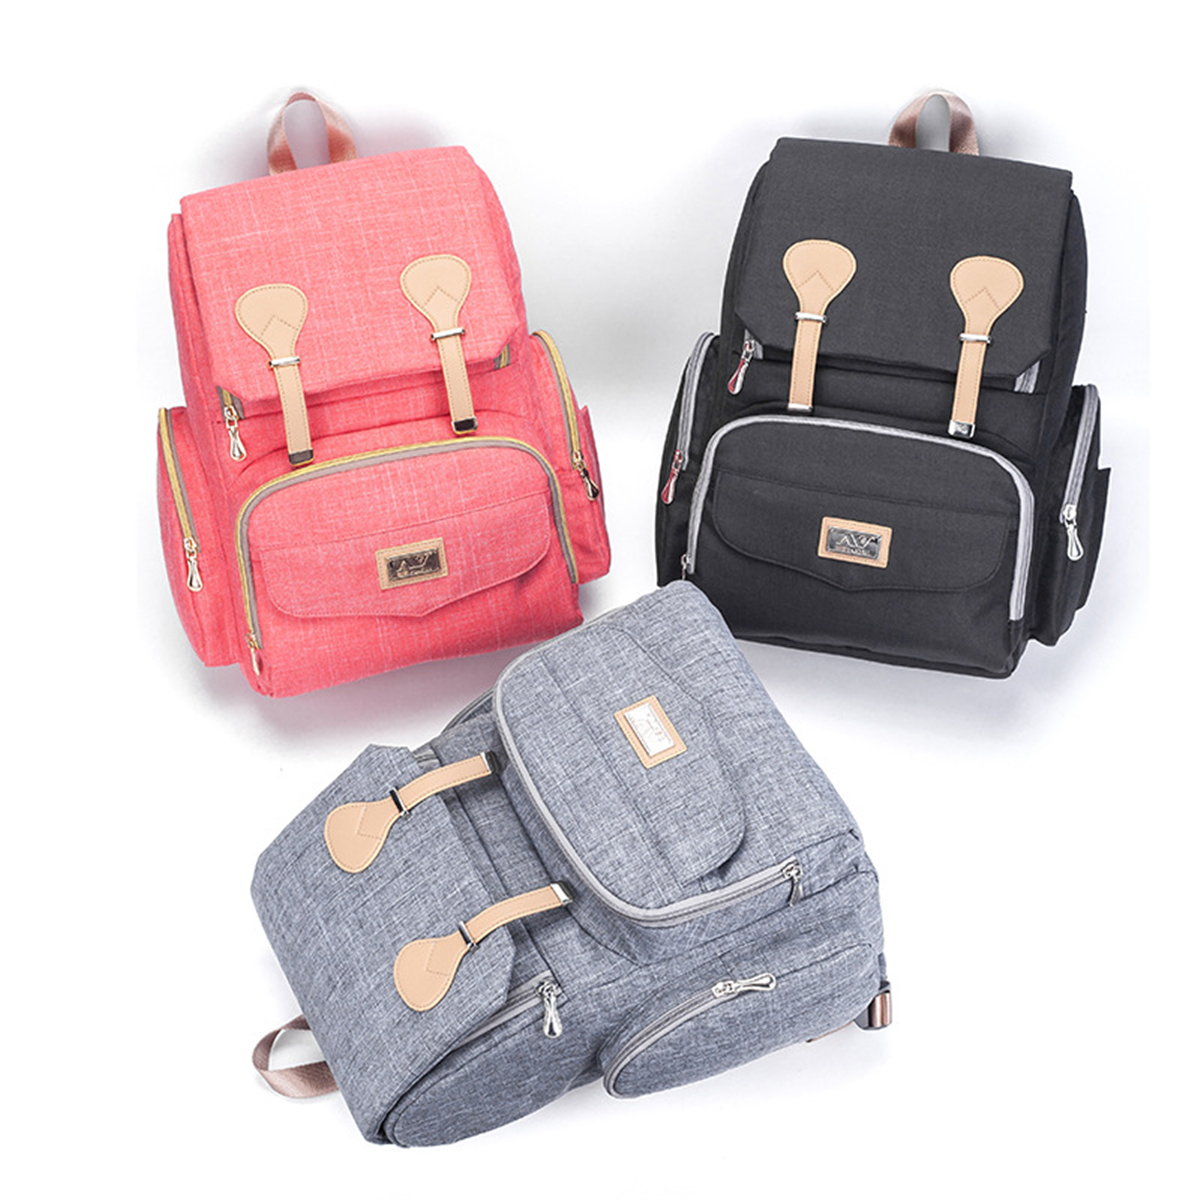 Waterproof Large Capacity Mummy Bag Outdoor Traveling Camping Backpack Handbag Storage Bag